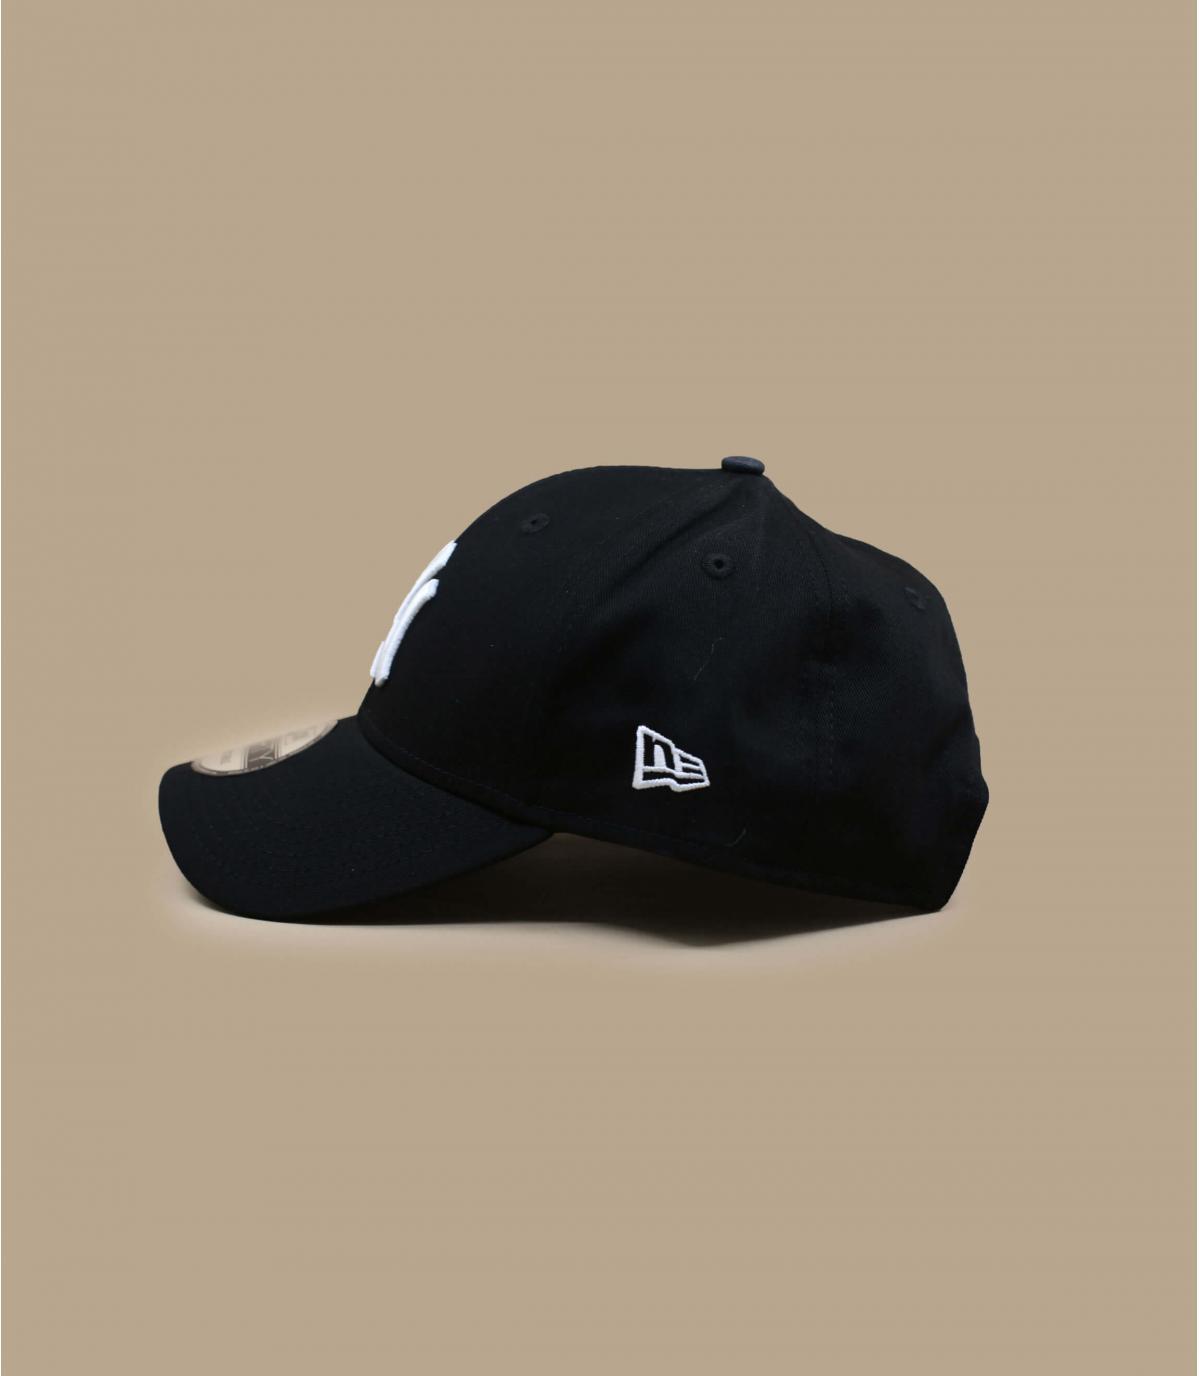 Adjustable navy cap